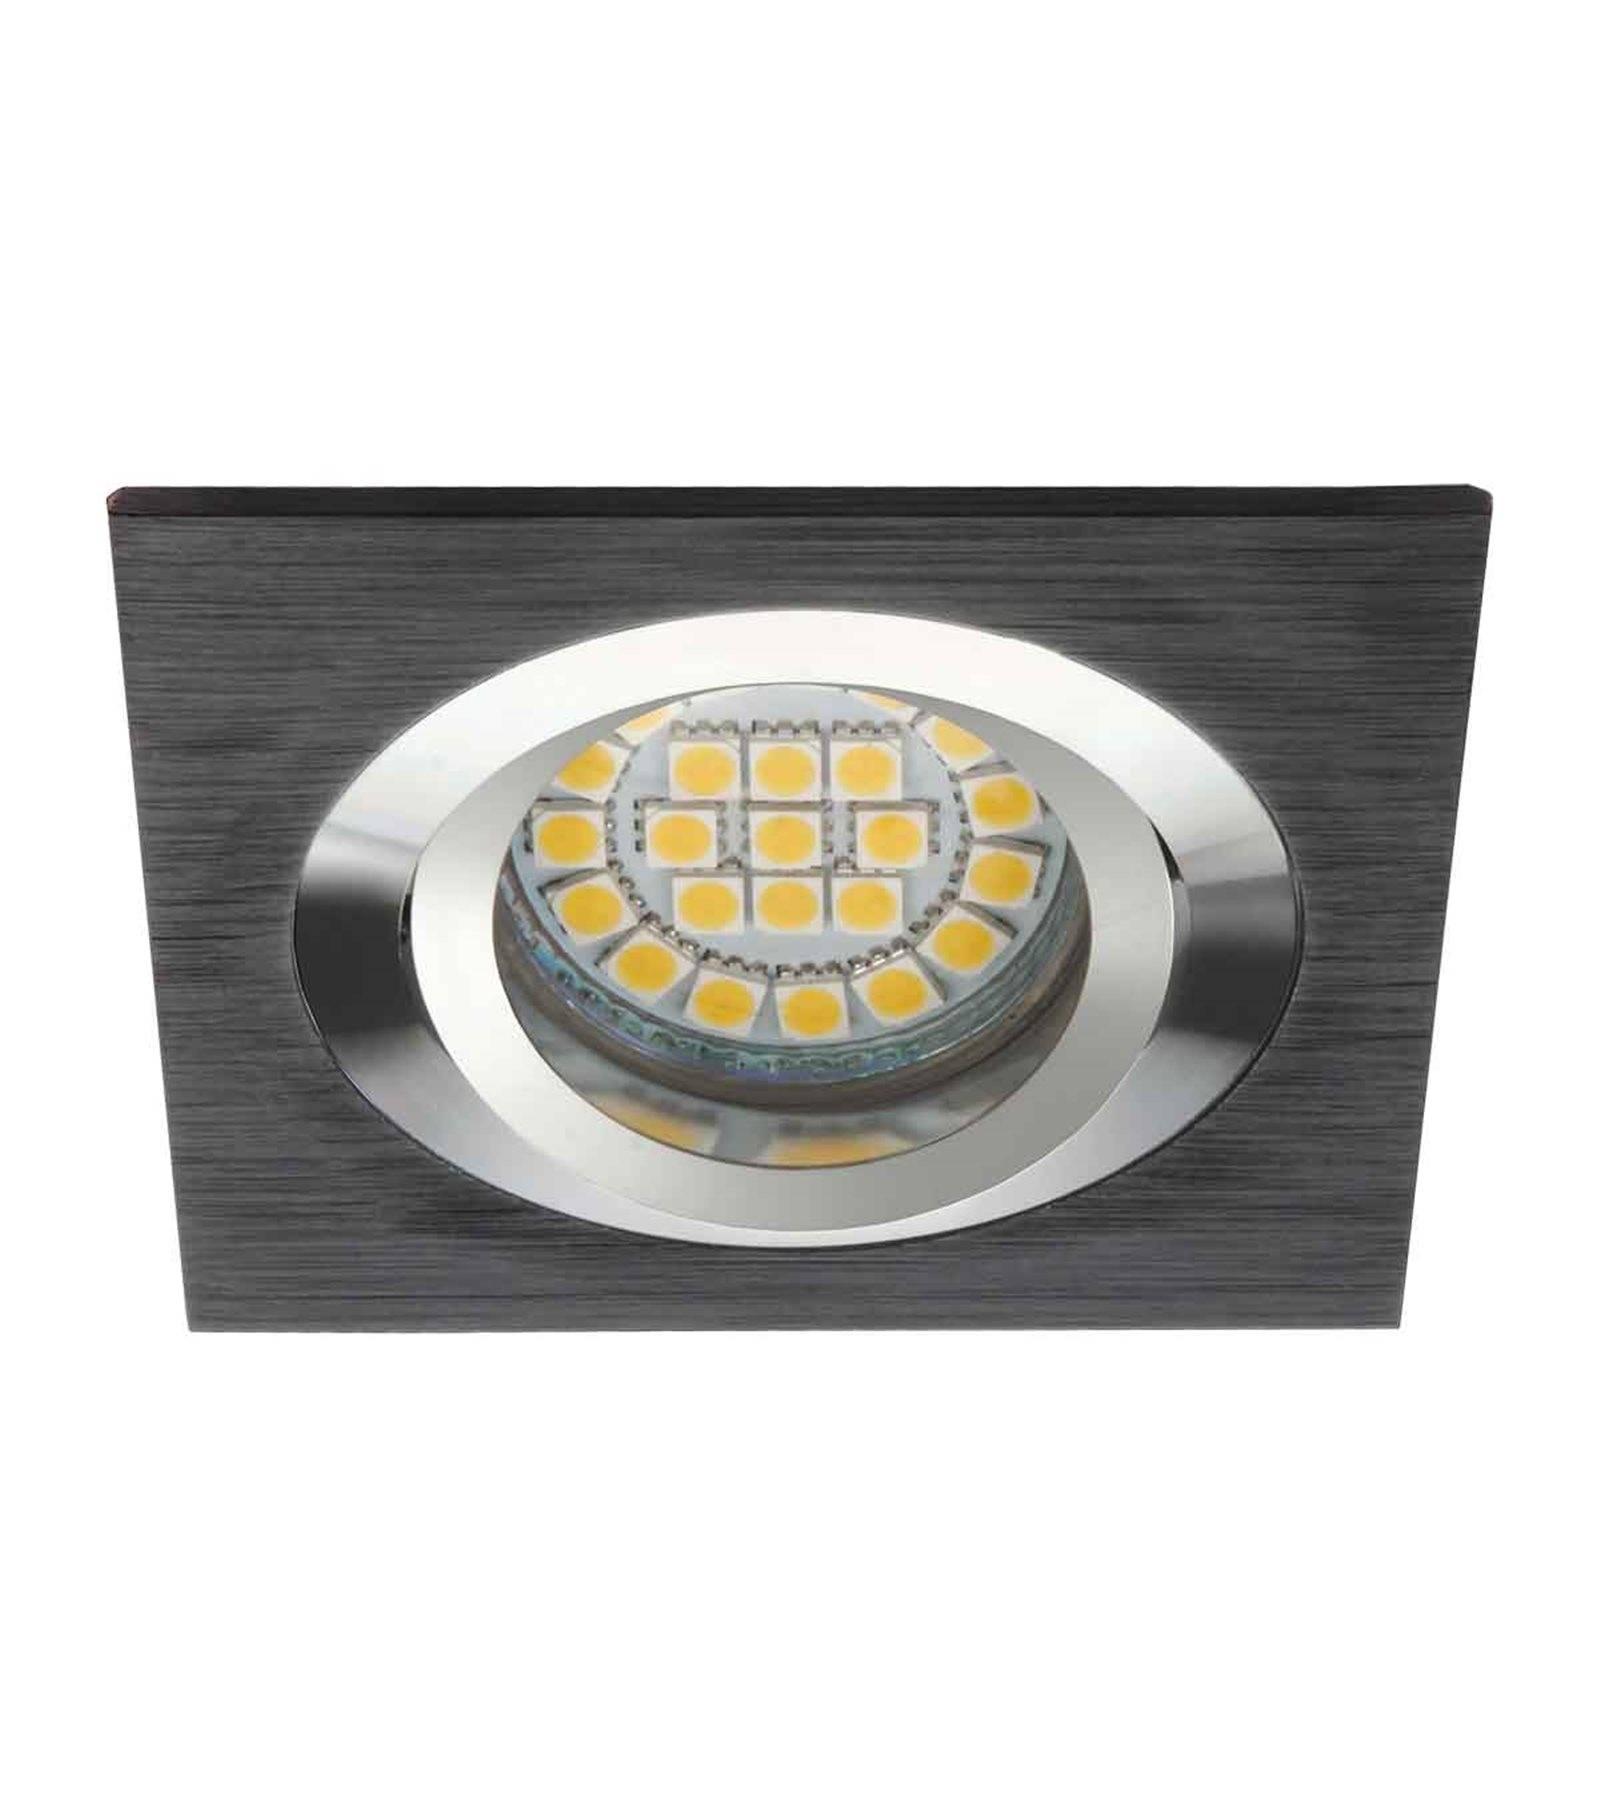 spot encastrable seidy aluminium bross noir carr gu5 3 gu10 ip20 orientable 30 kanlux. Black Bedroom Furniture Sets. Home Design Ideas